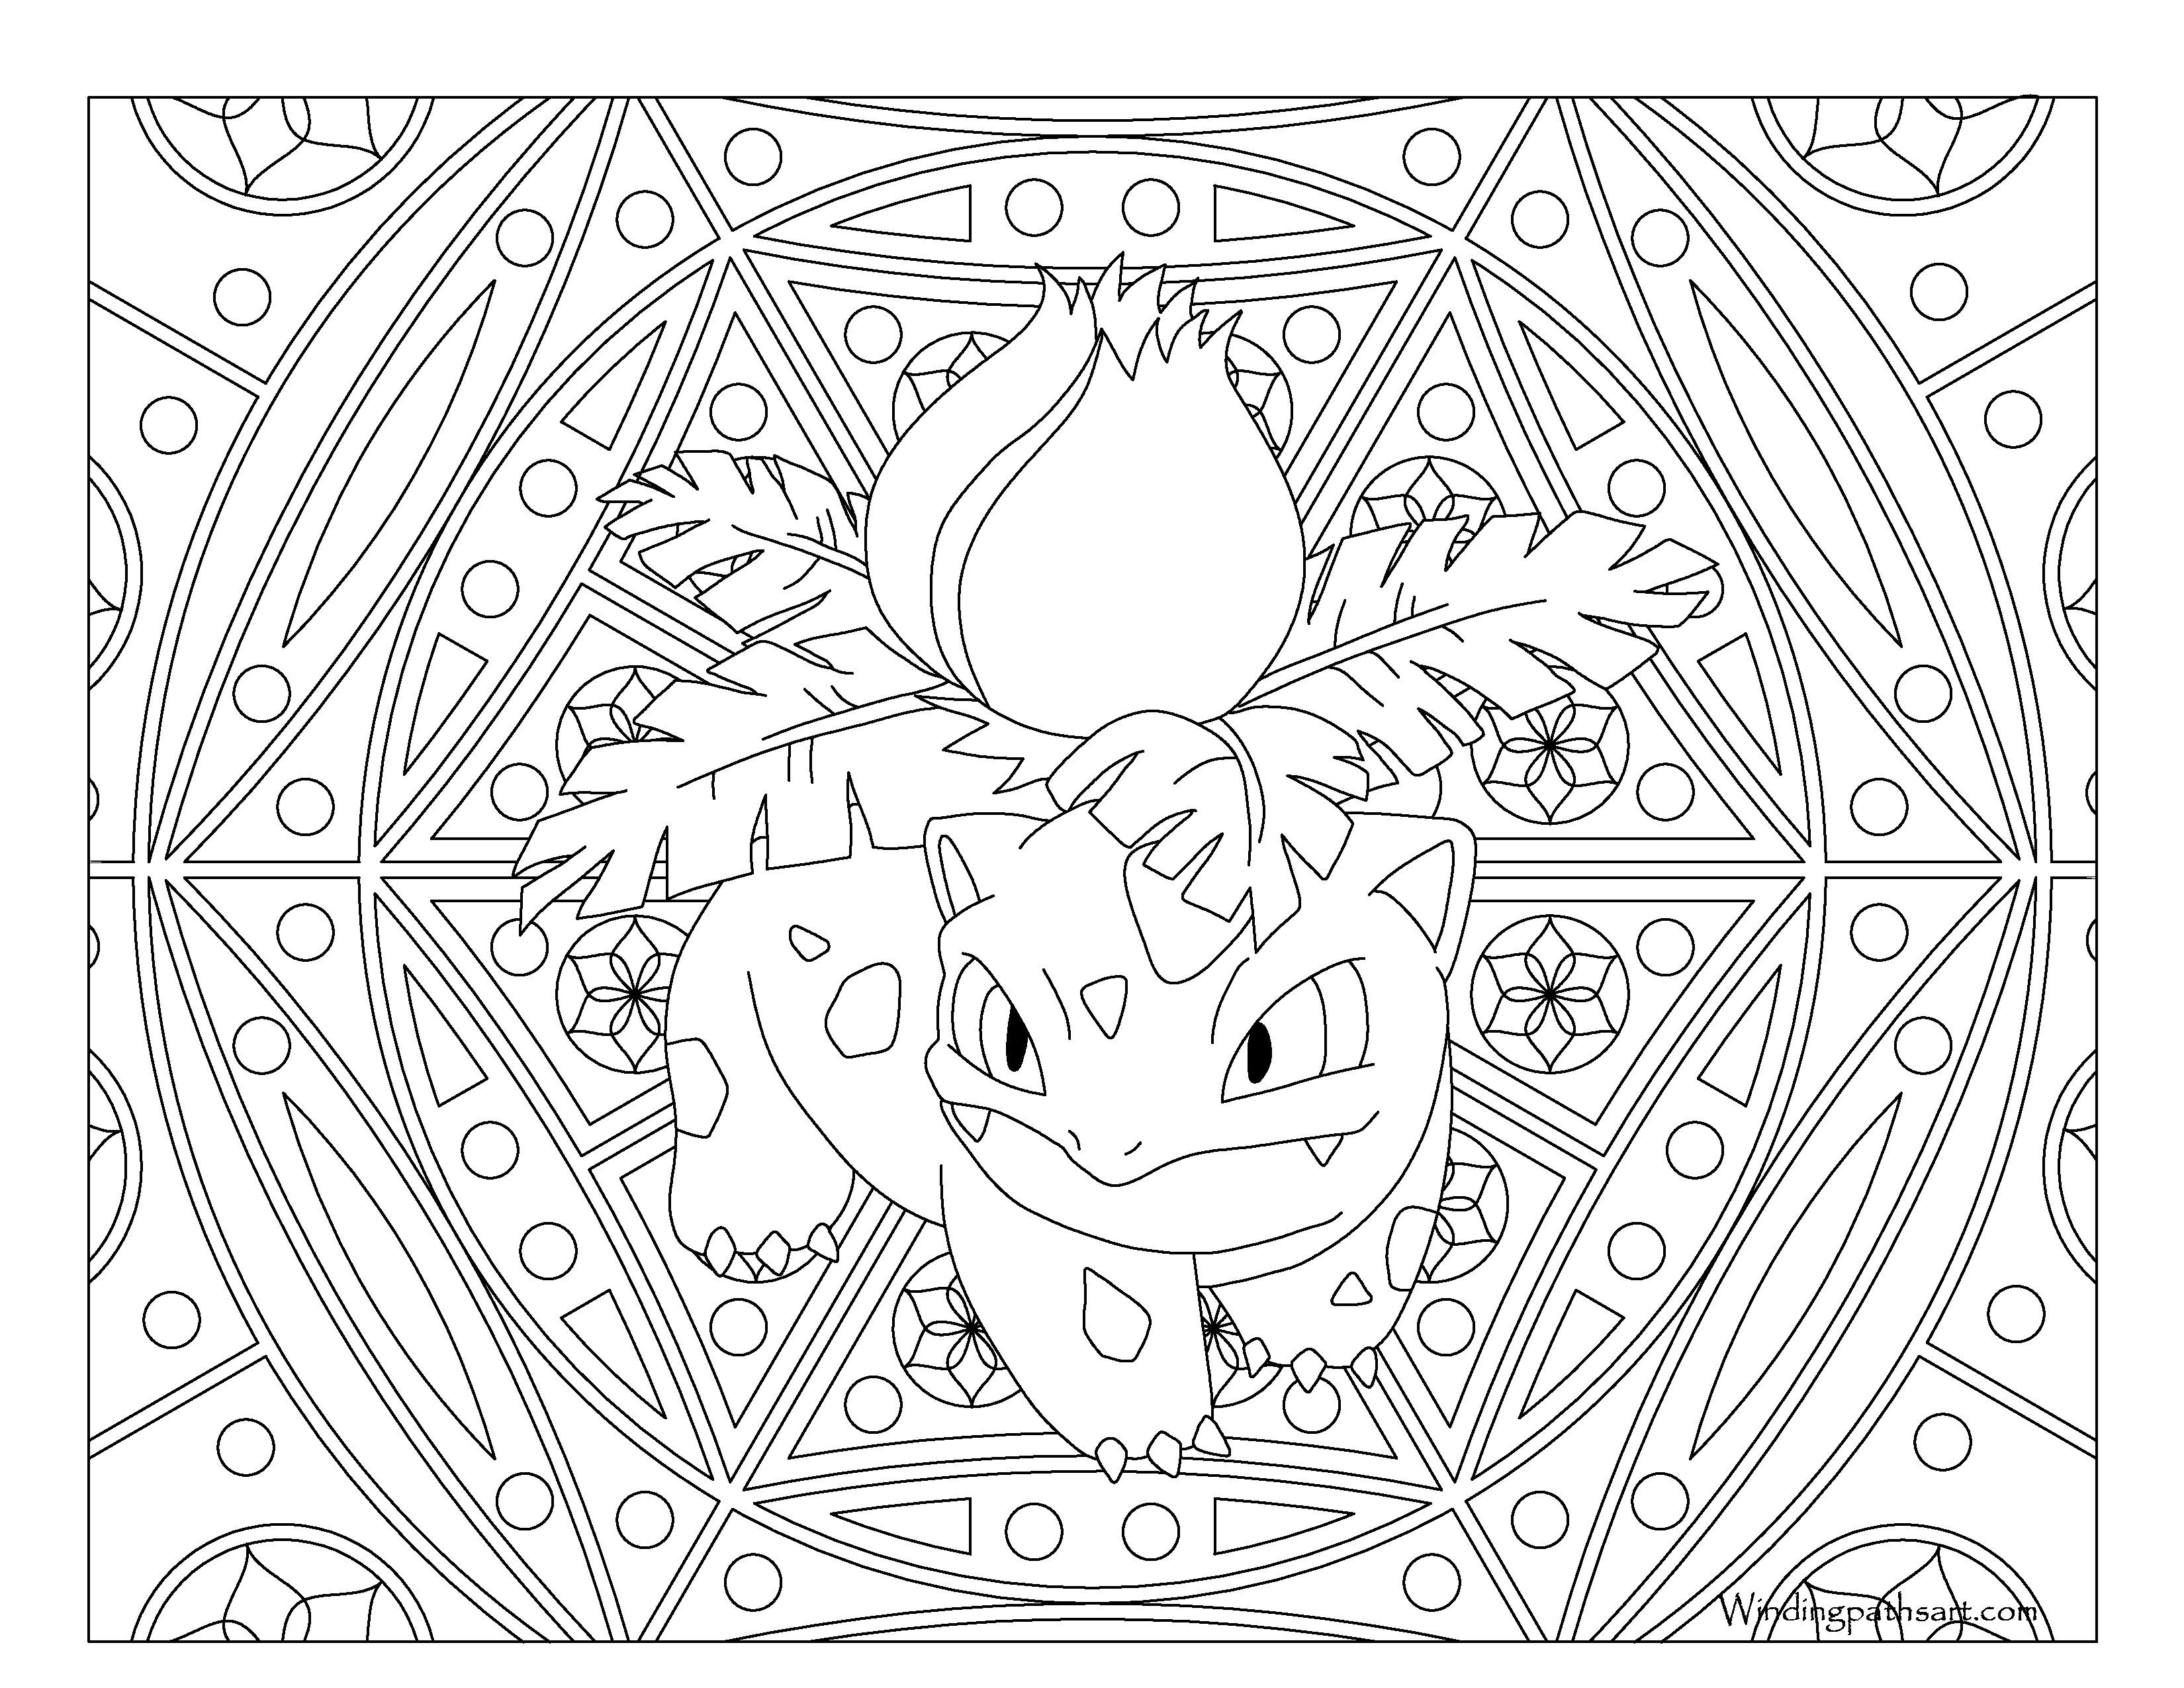 ausmalbilder pokemon solgaleo genial the best free ivysaur